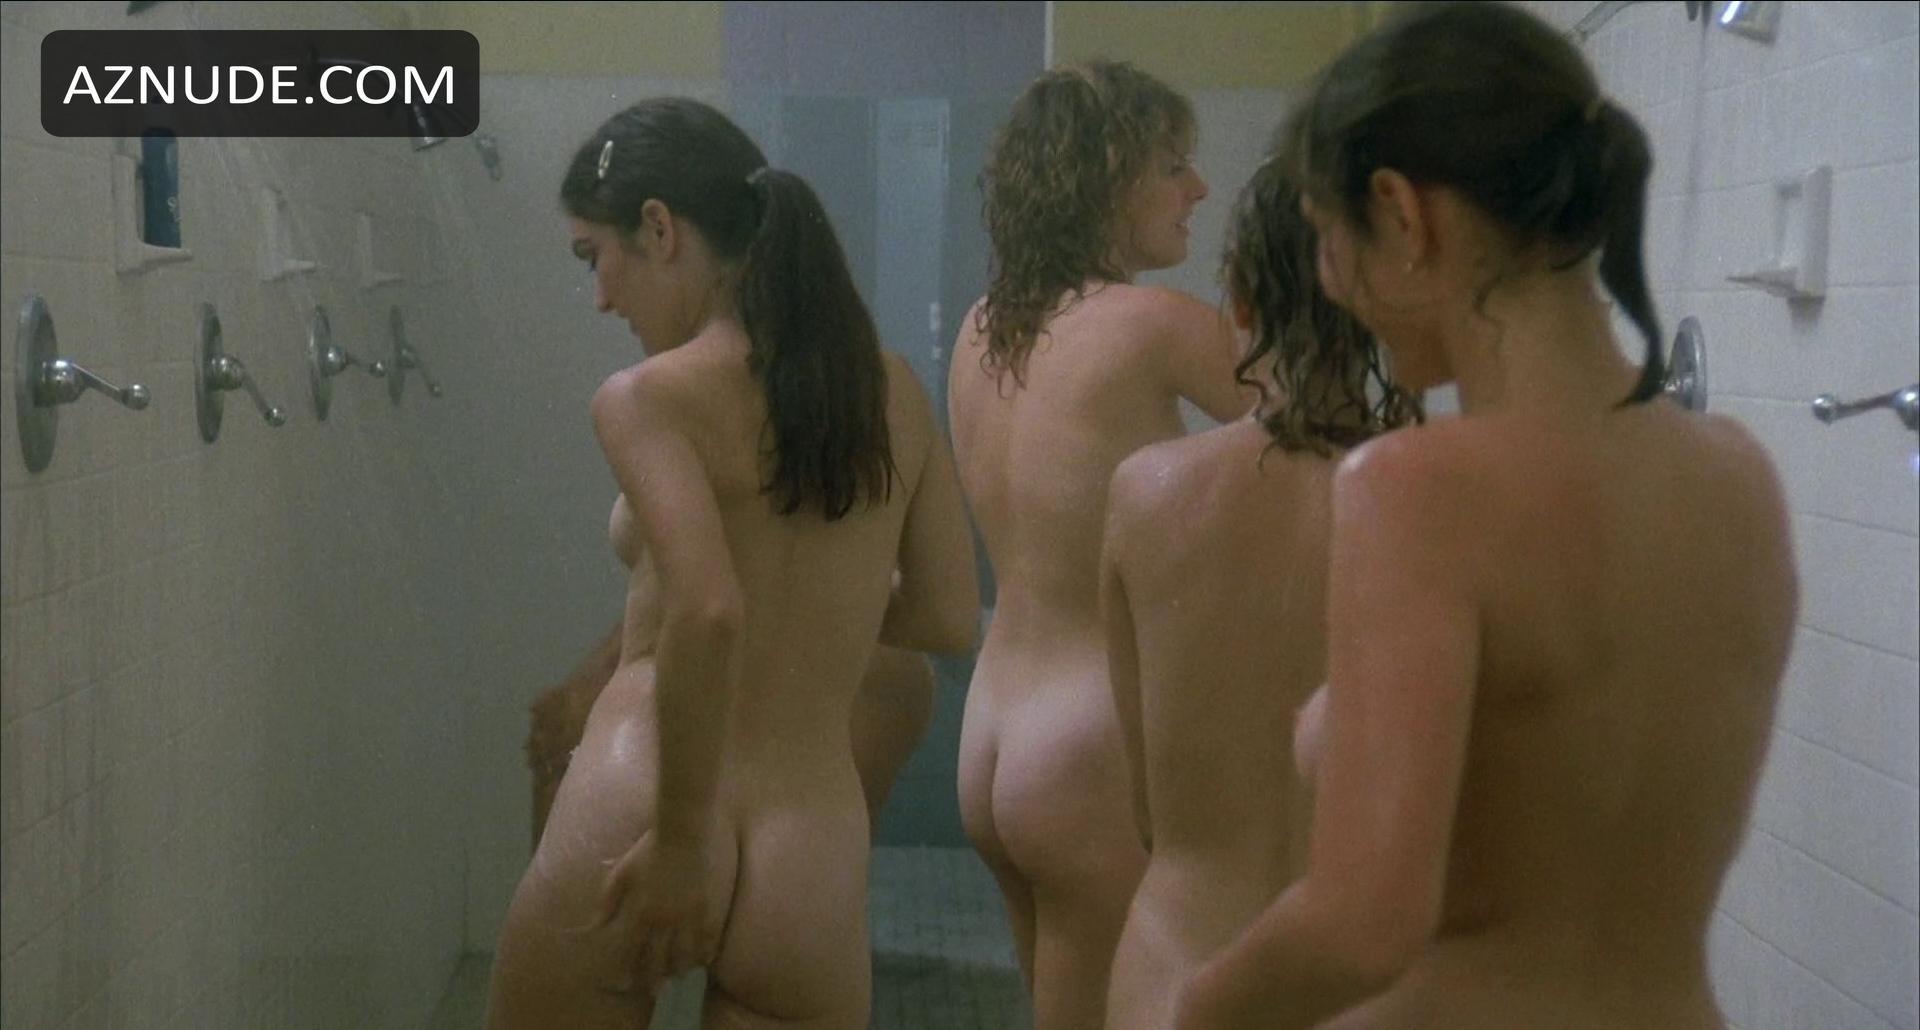 Was the nude school